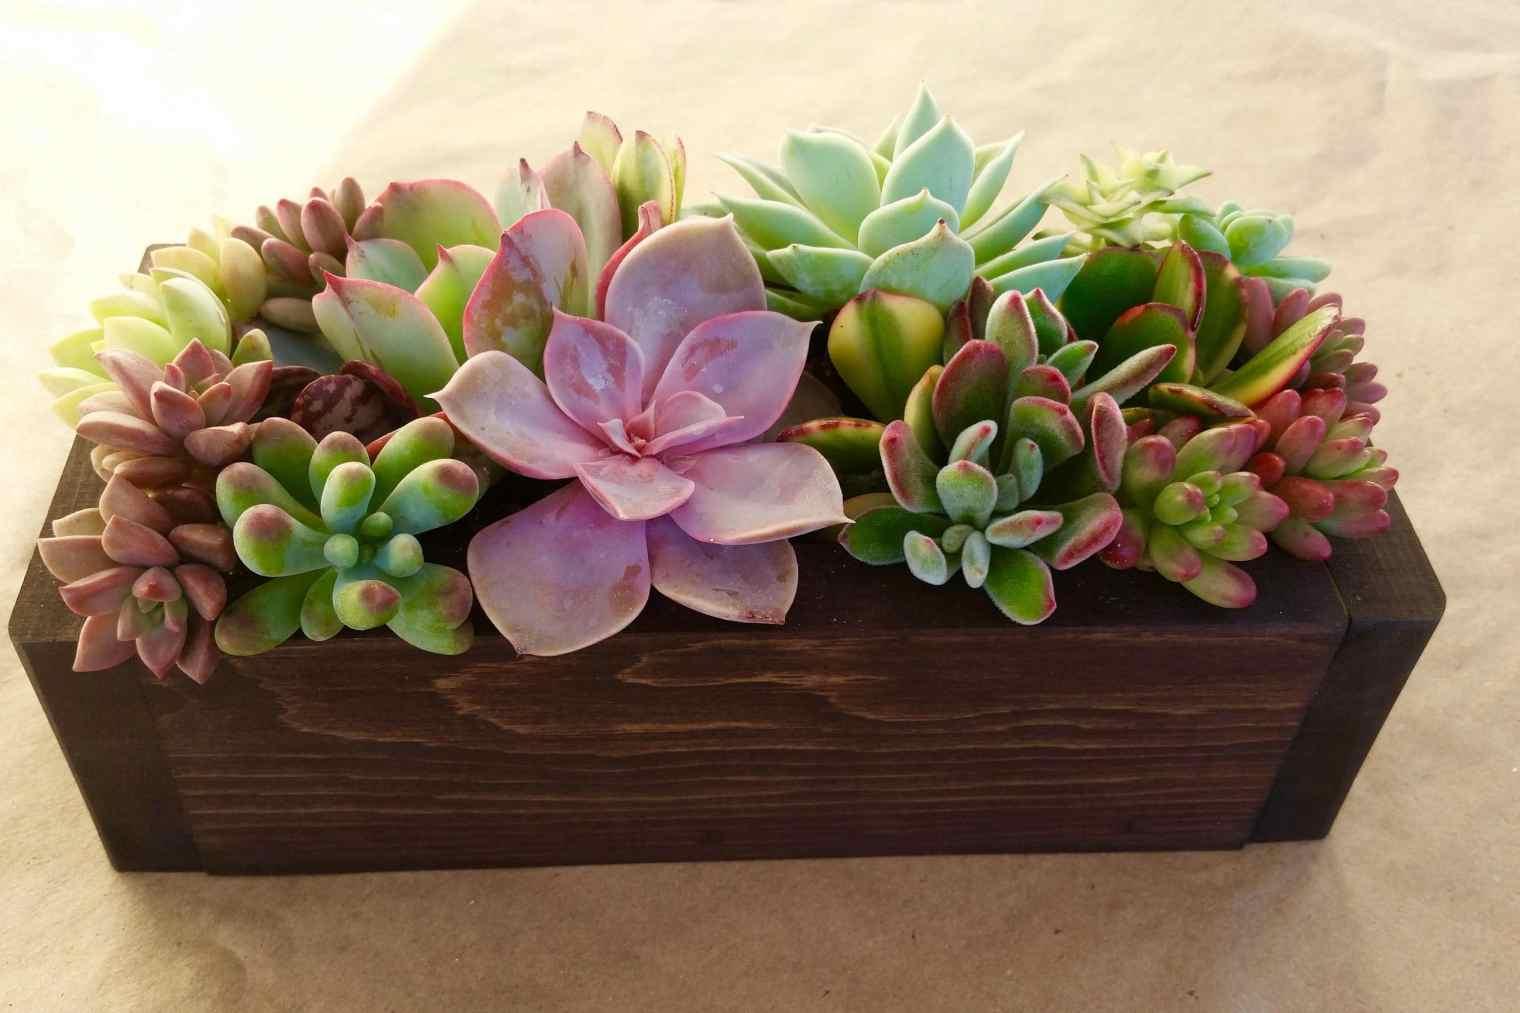 Floral arrangements by Mark K. Mitchell